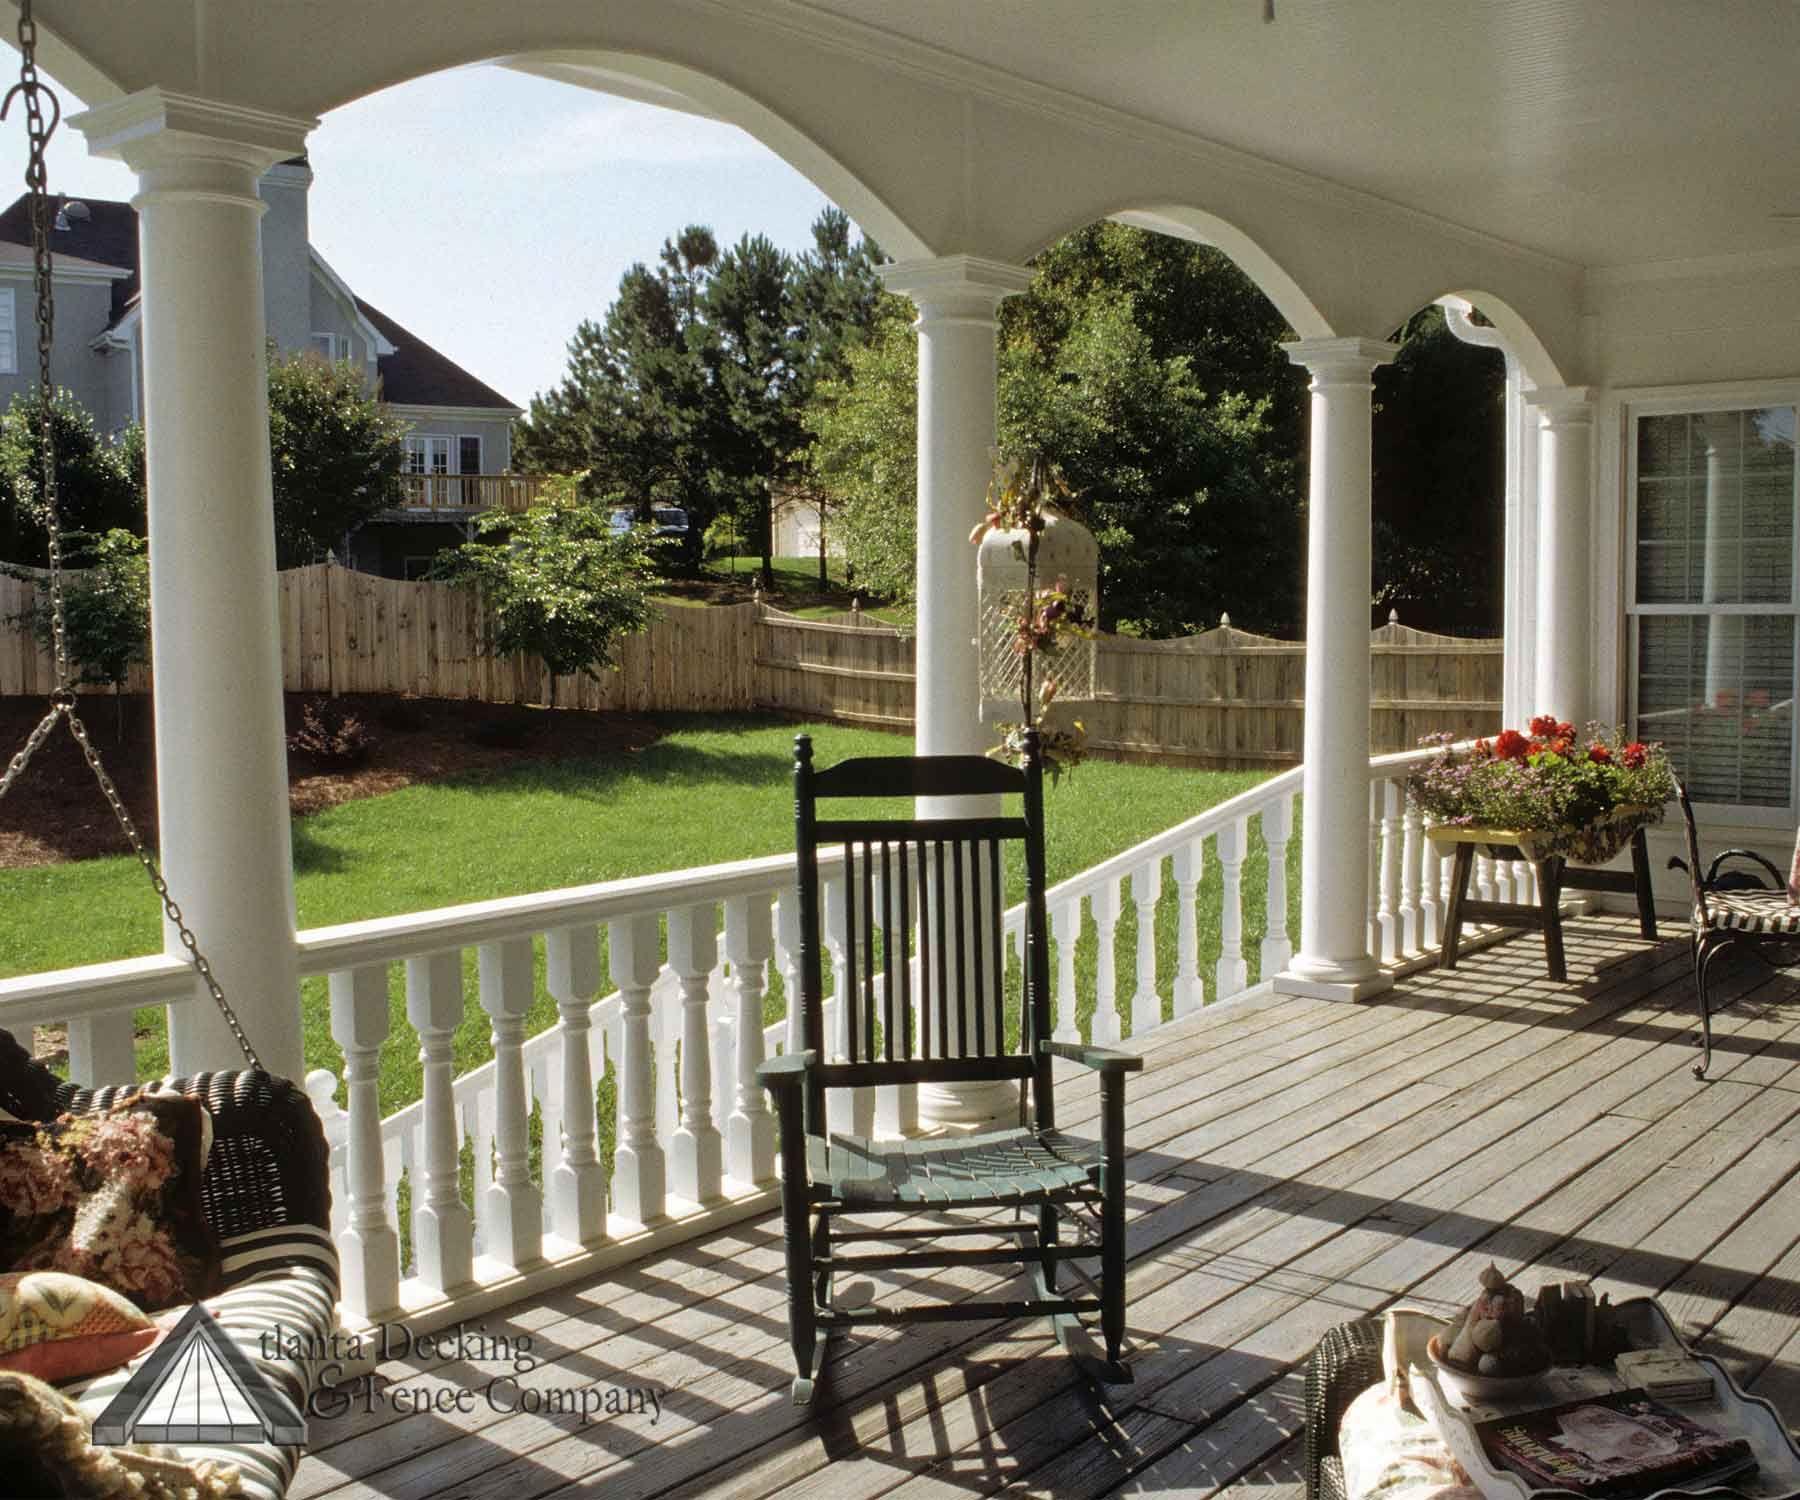 Backporches Google Search Porch Columns Back Porch Designs Back Porch